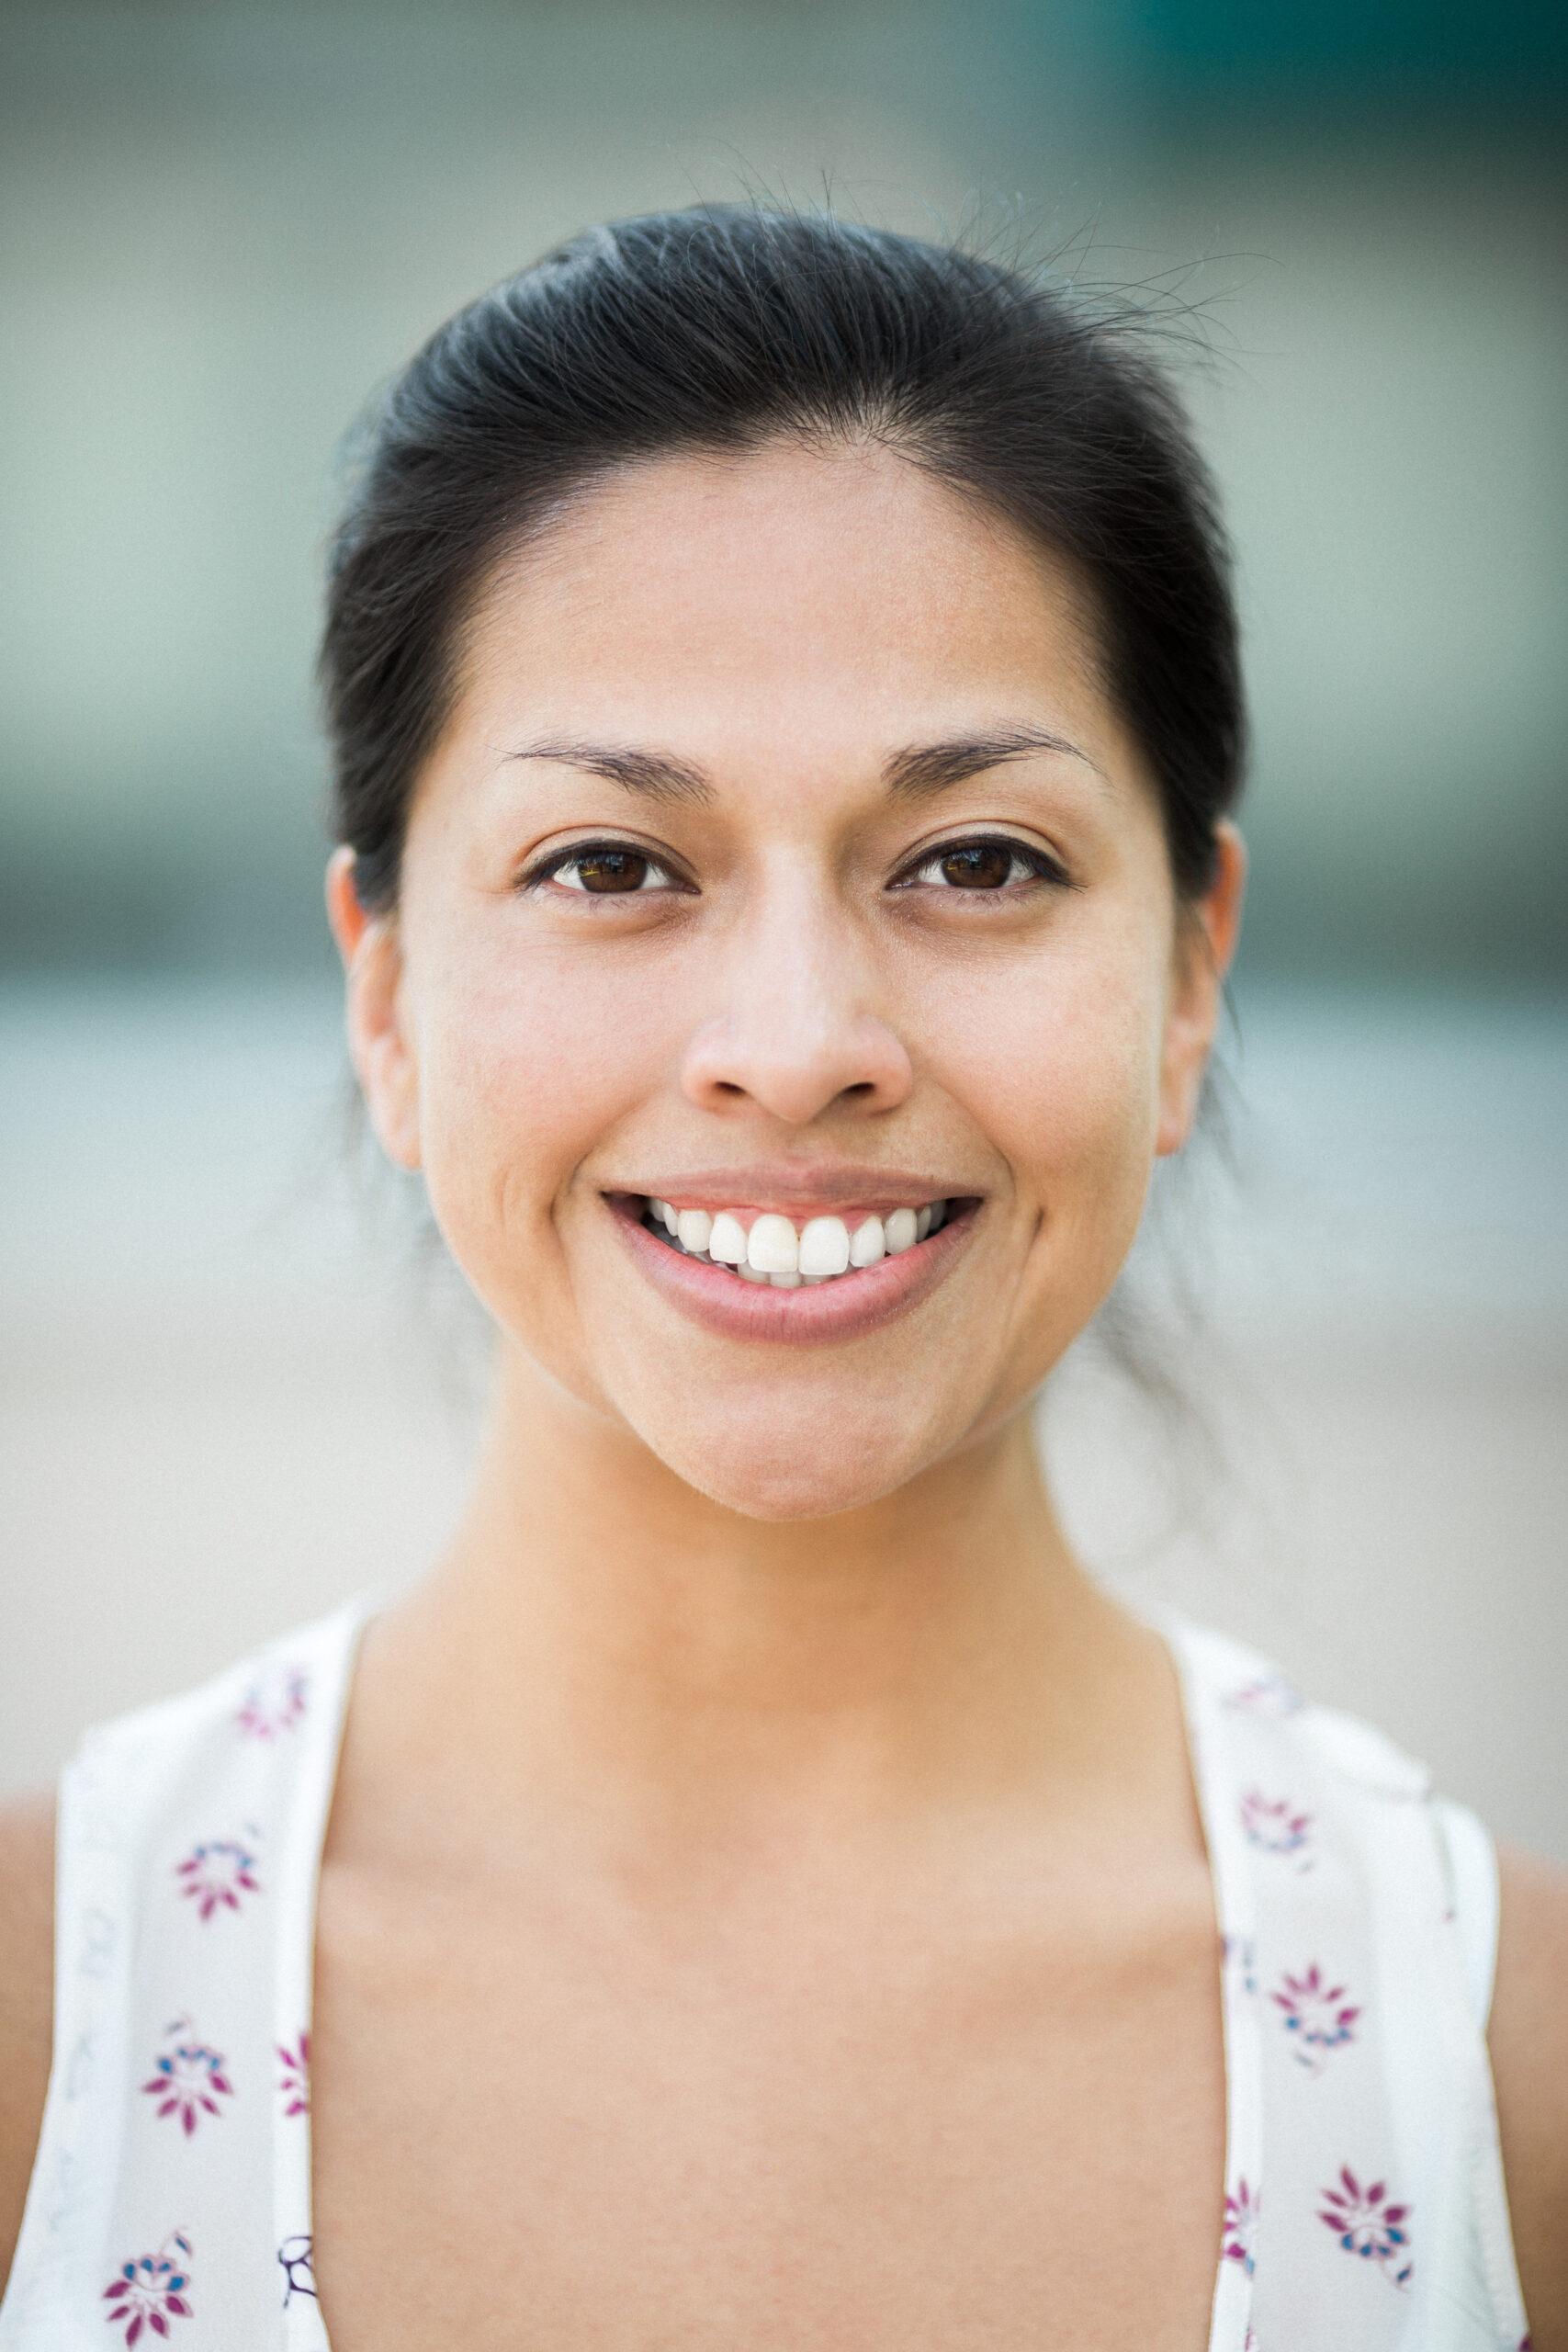 Maria Barrios Sazo